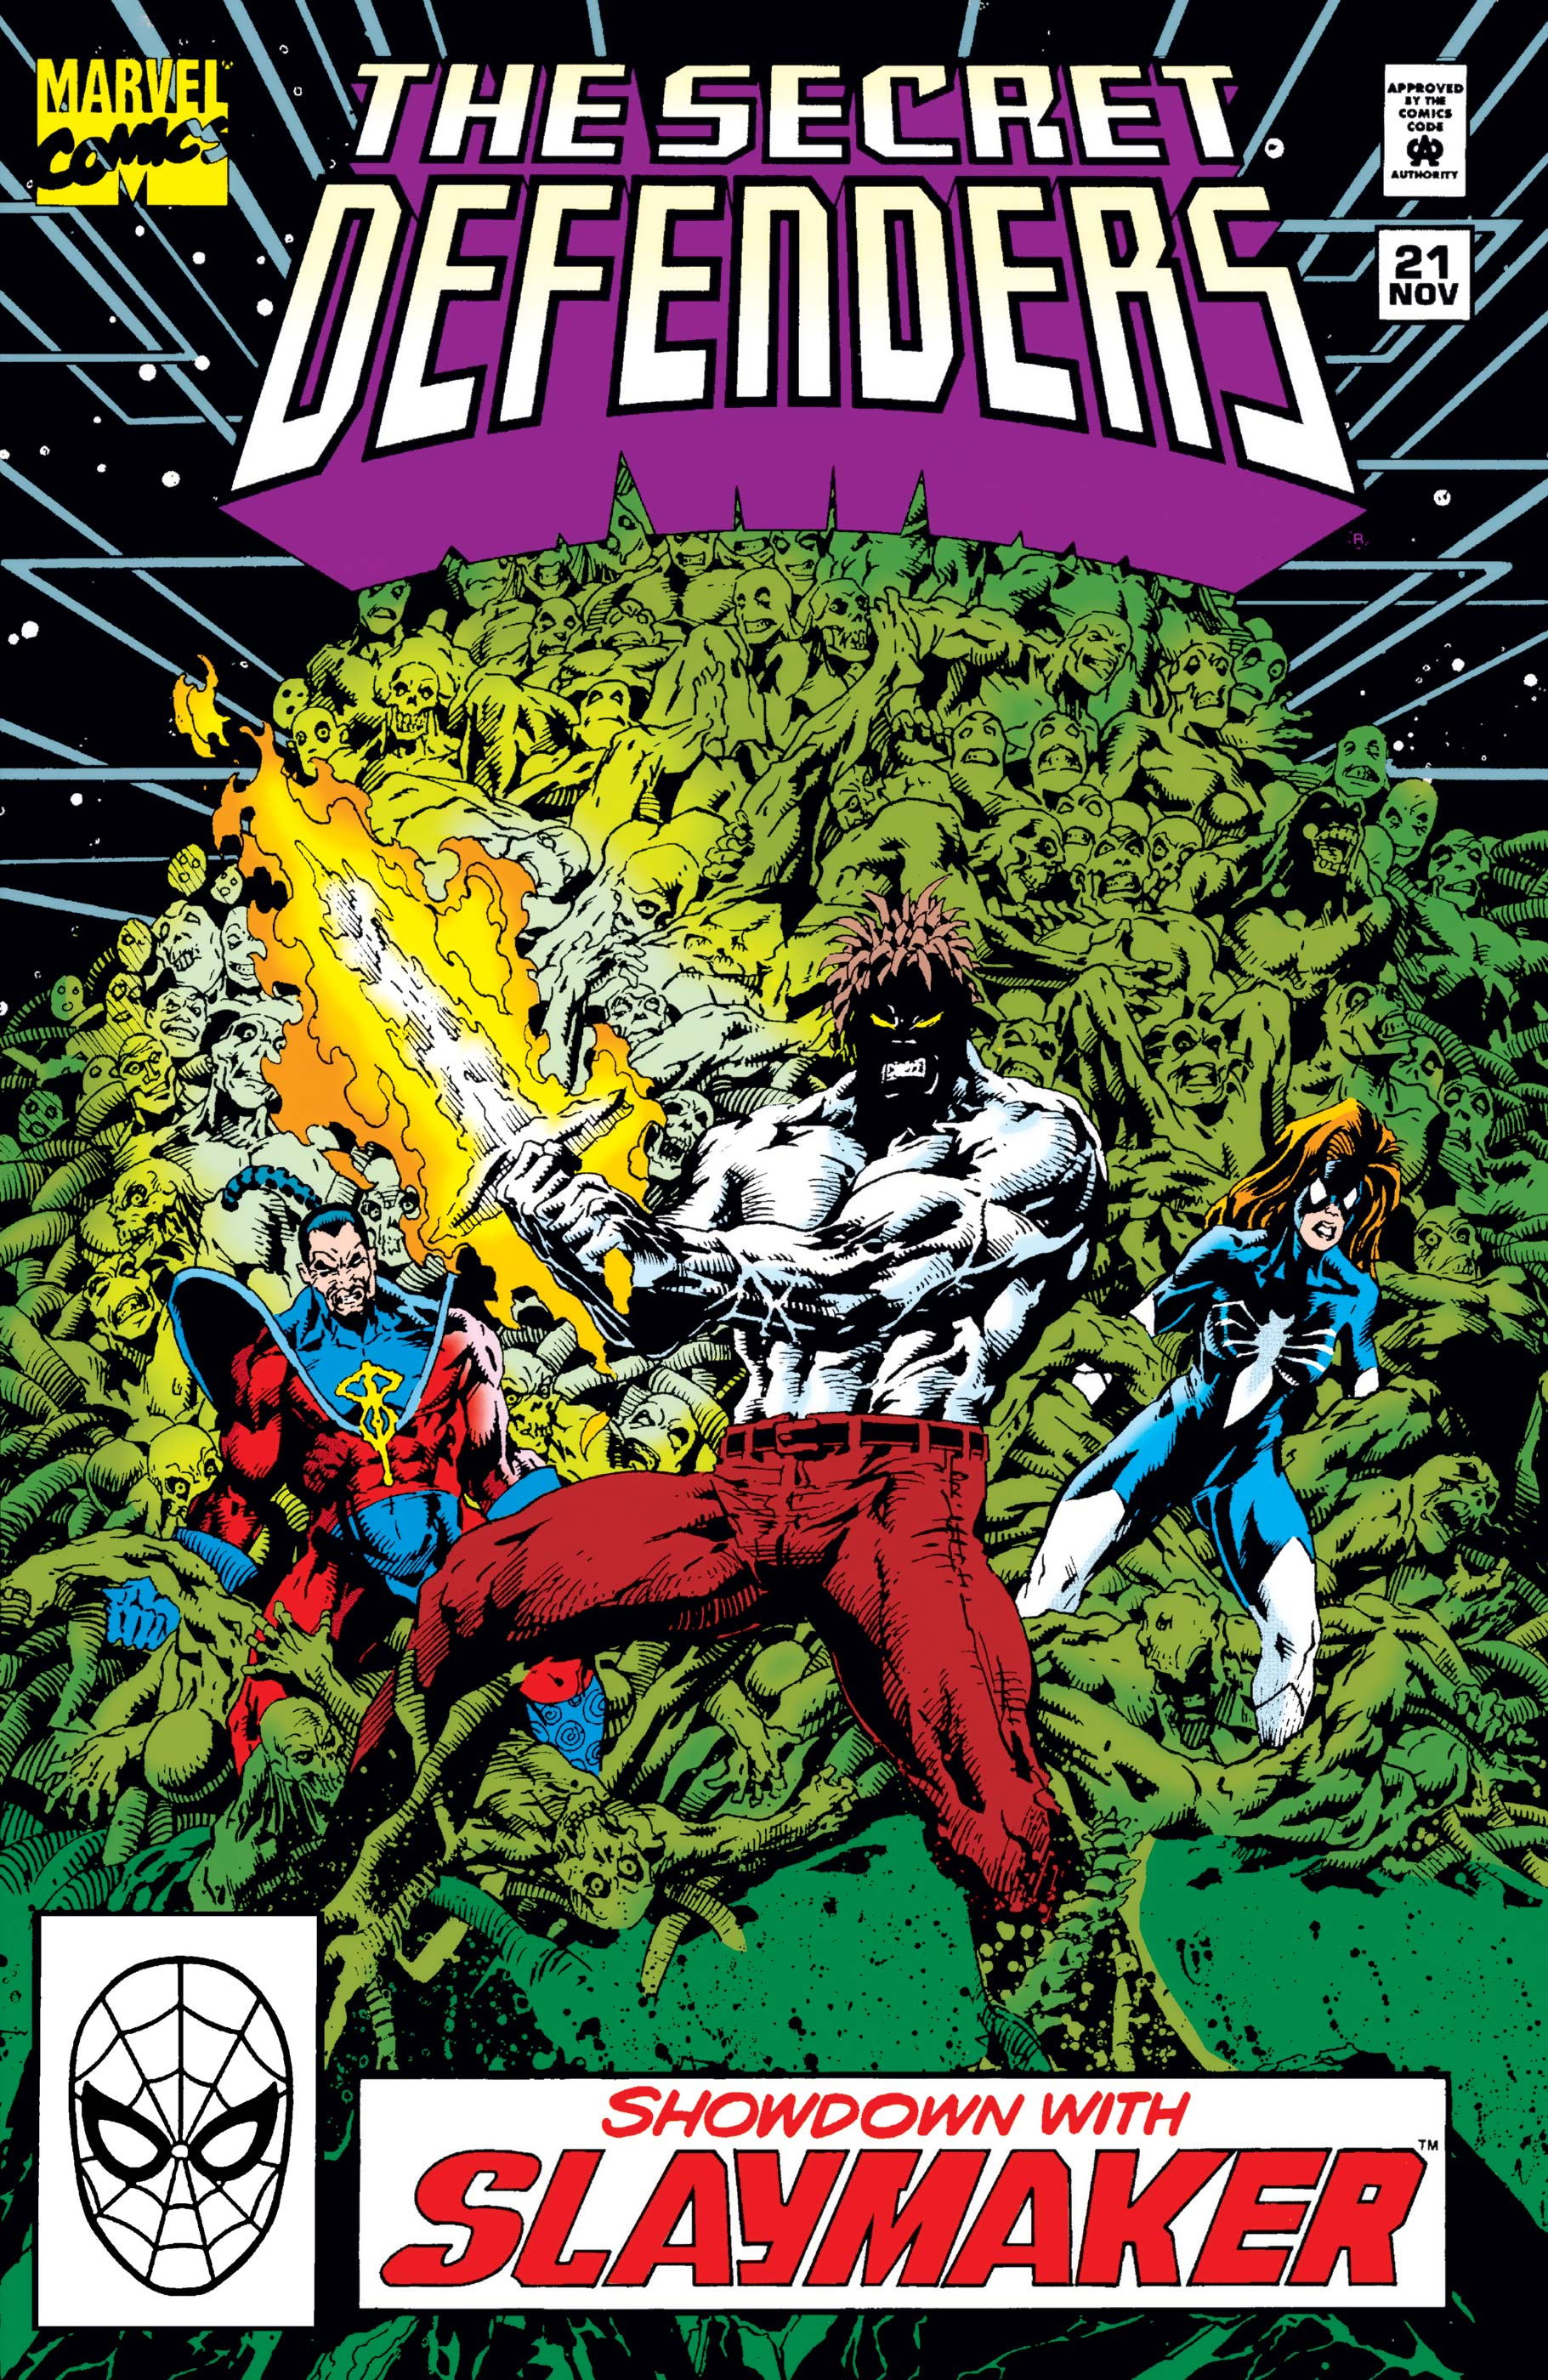 Secret Defenders (1993) #2